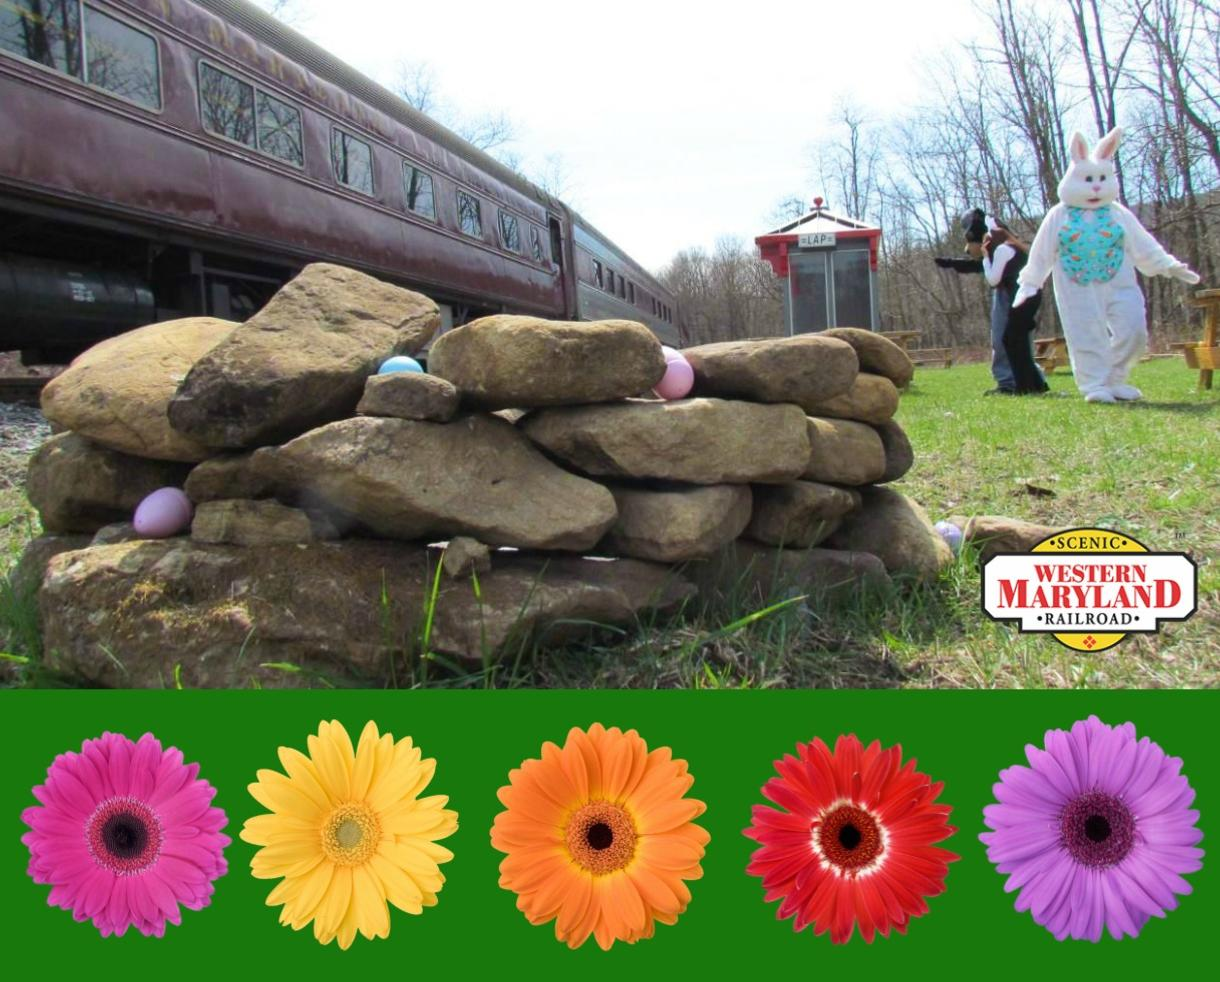 Western Maryland Scenic Railroad: Bunny Hop Train Ride